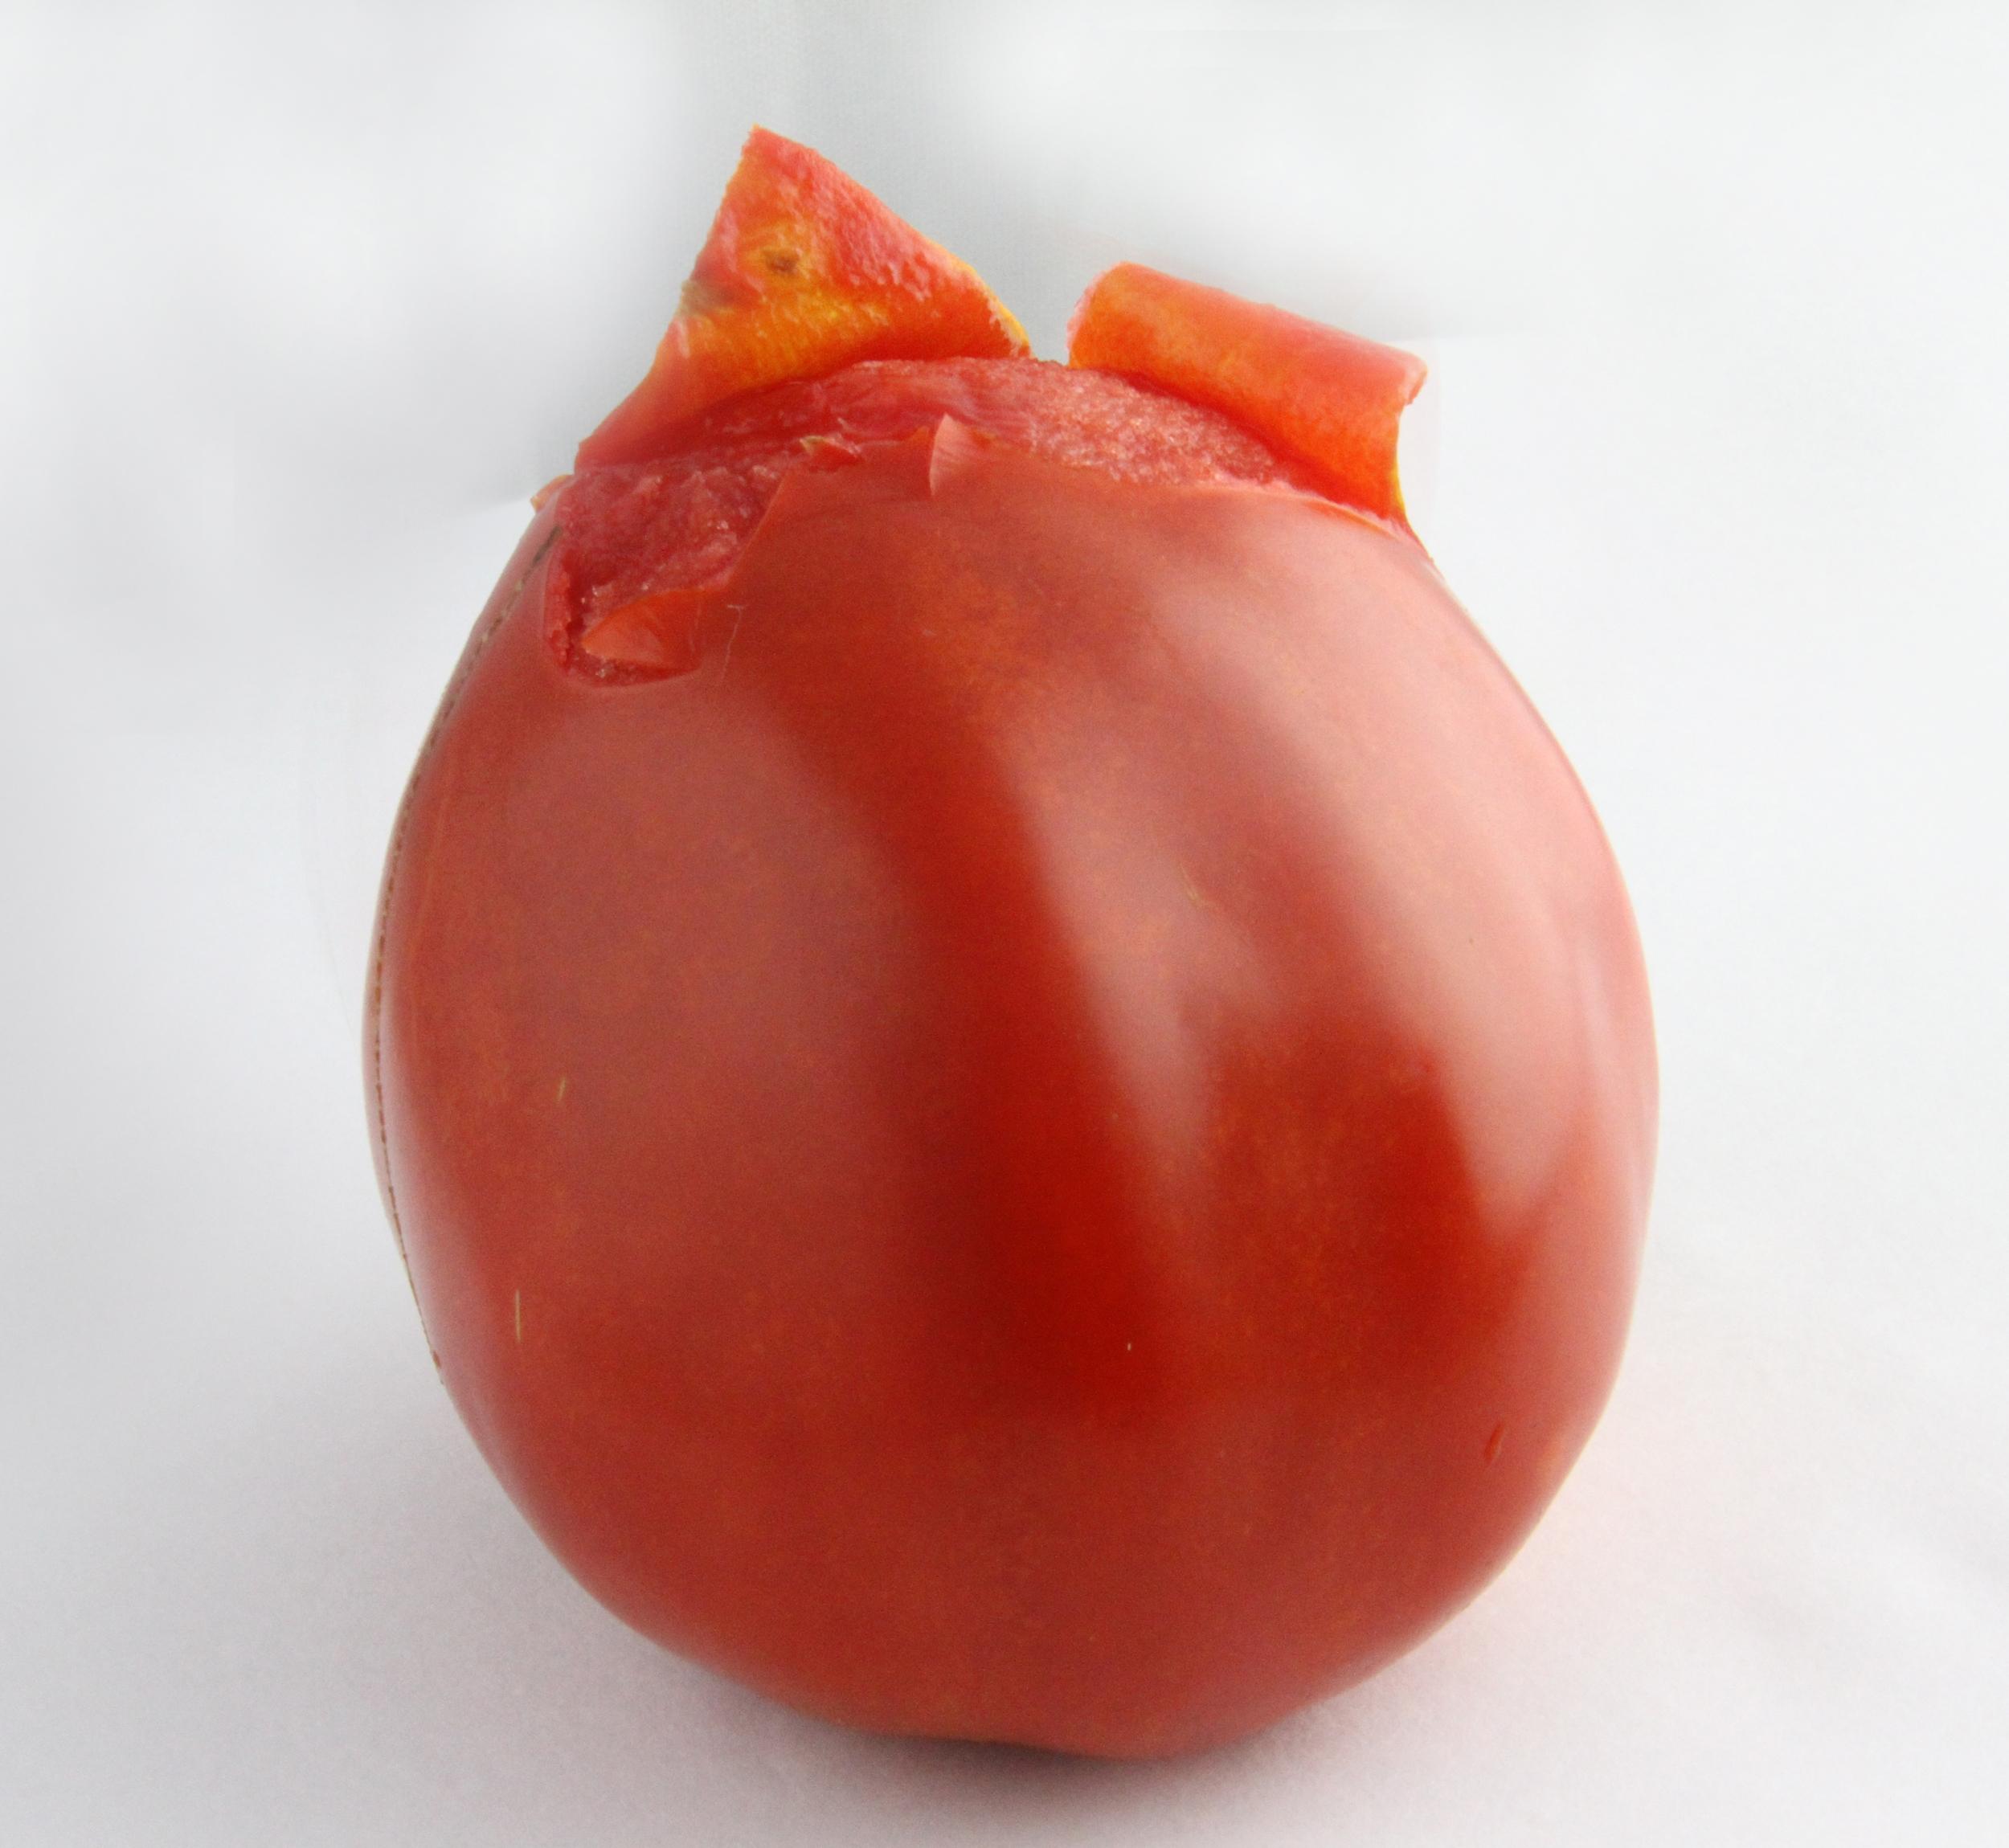 This red tomato has yellow skin.